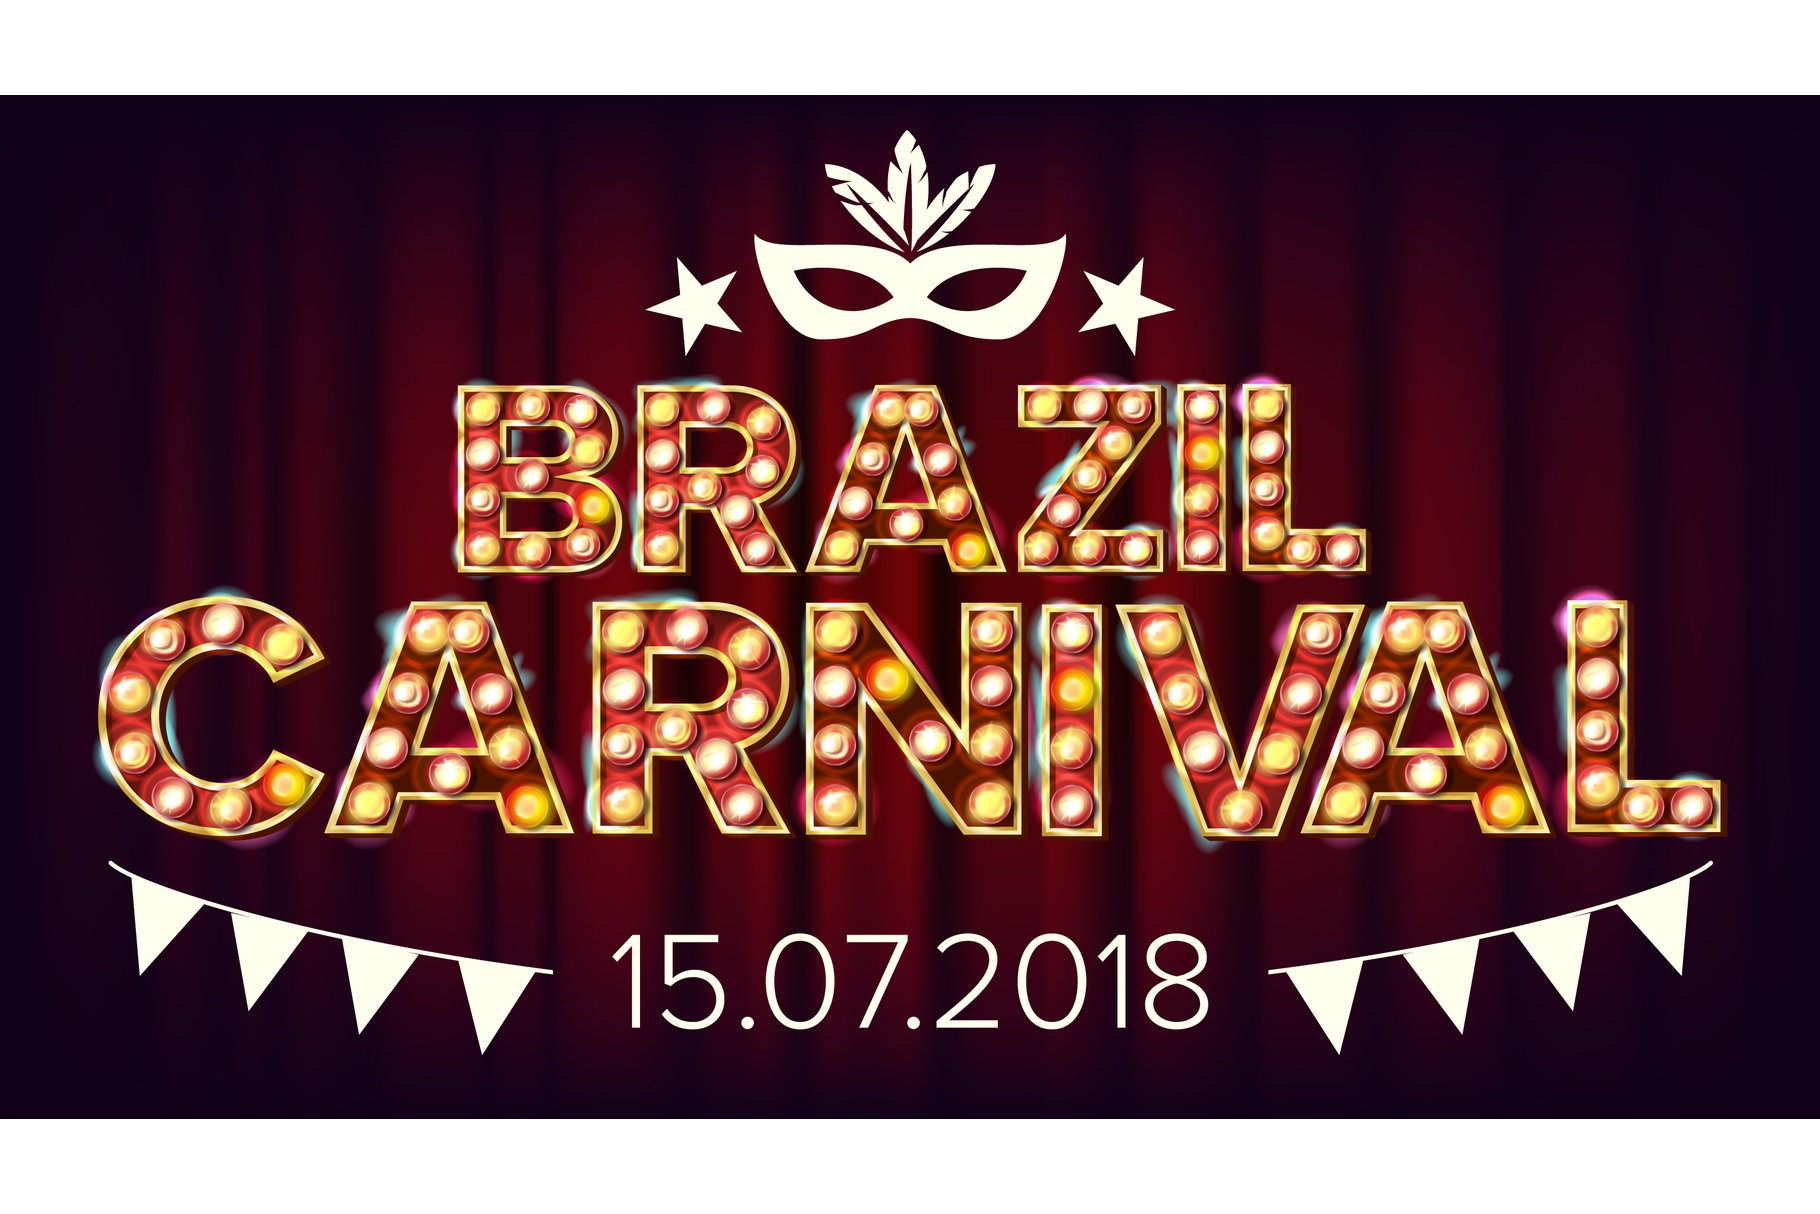 Brazil Carnival Banner Vector. Carnival Lamp Background. For example image 1